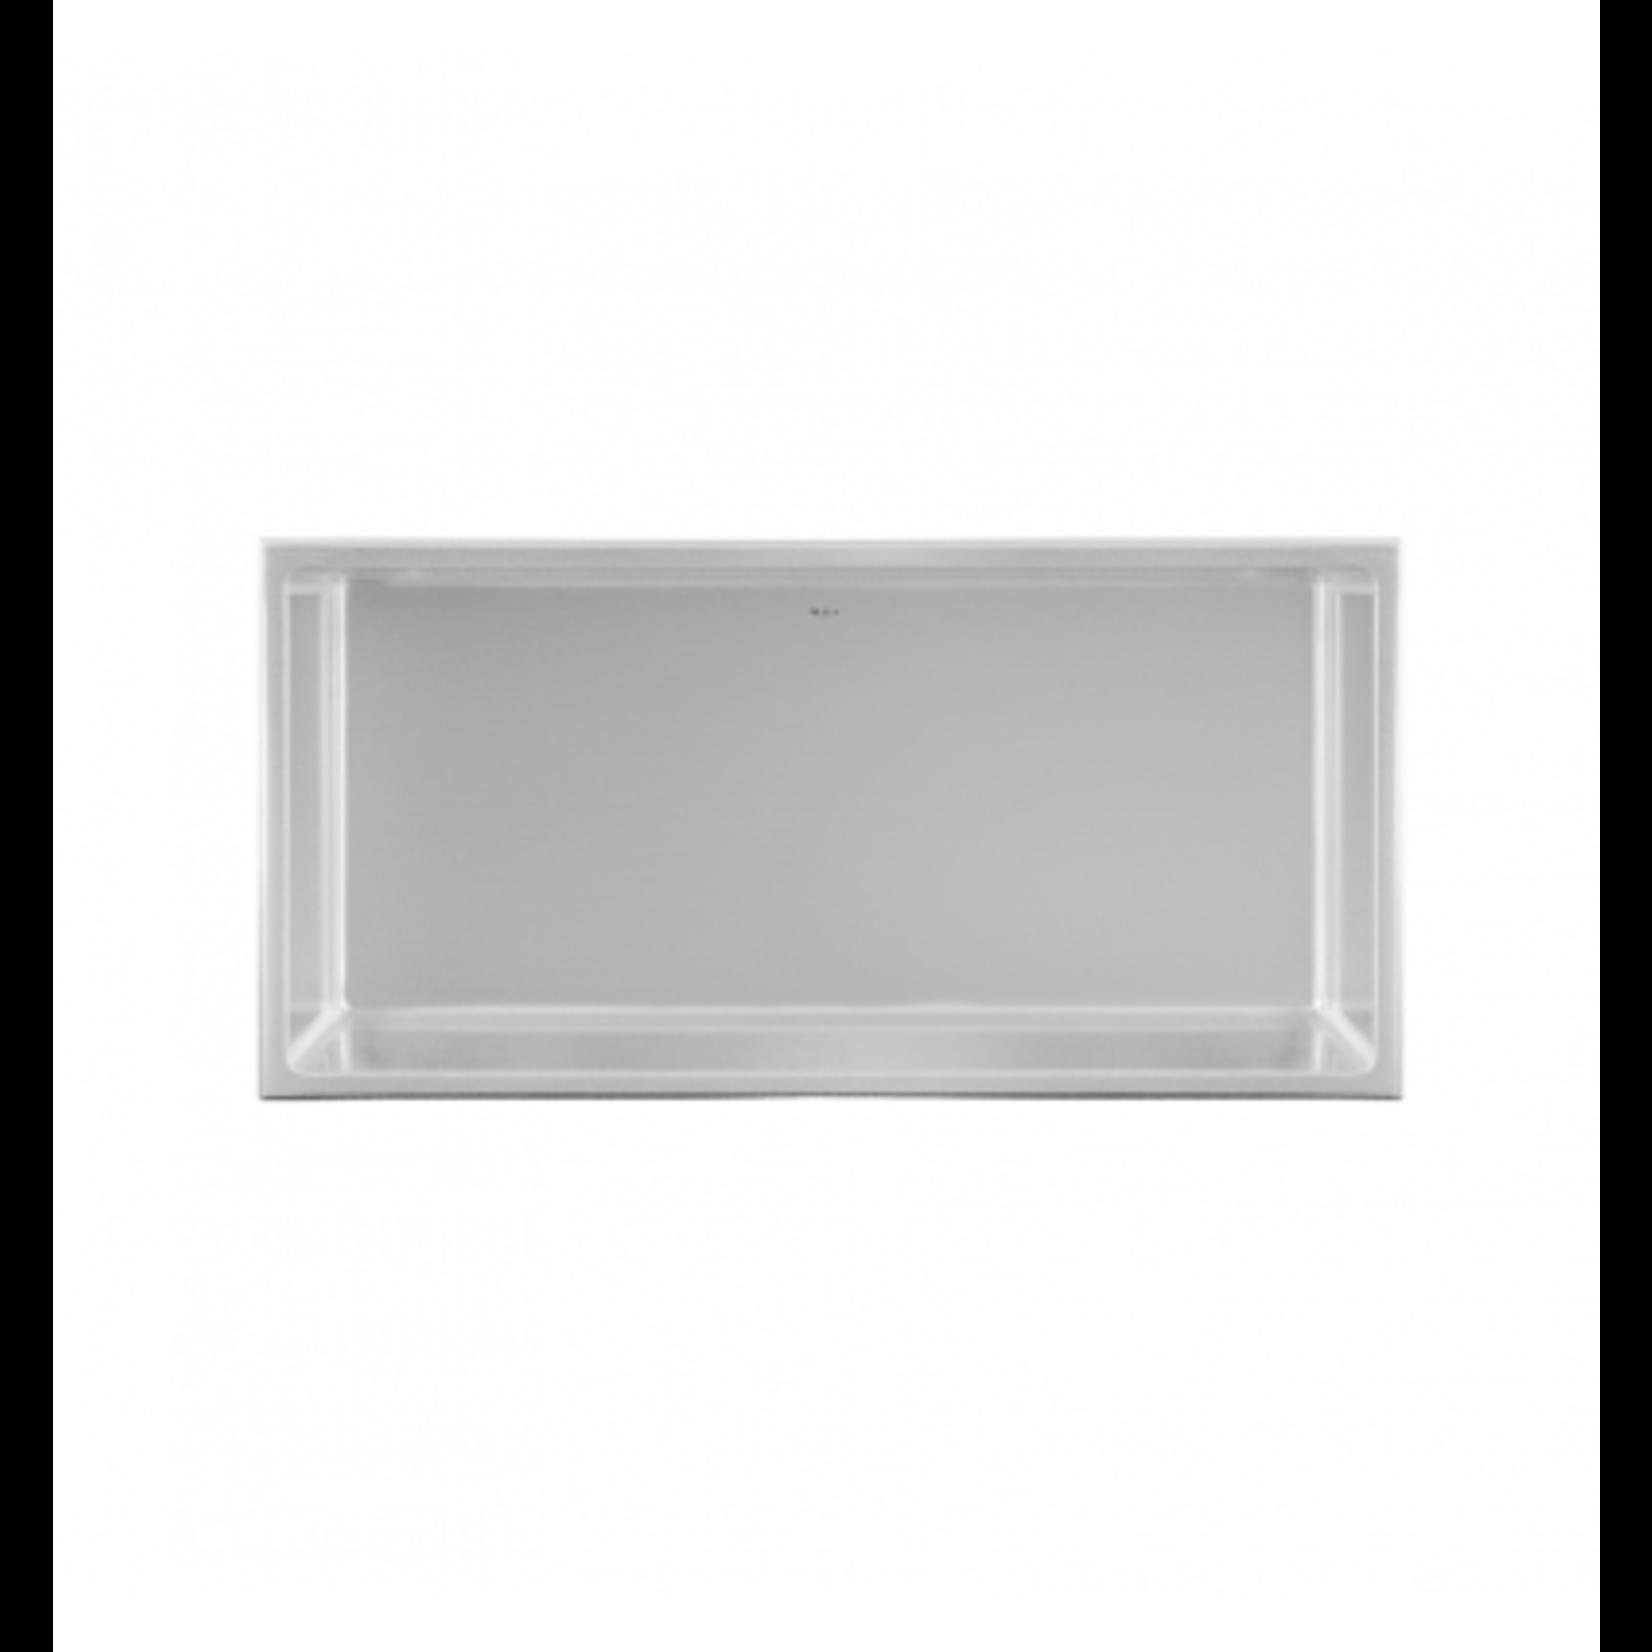 Wall niche 12x24 Stainless steel Nautika NI1224